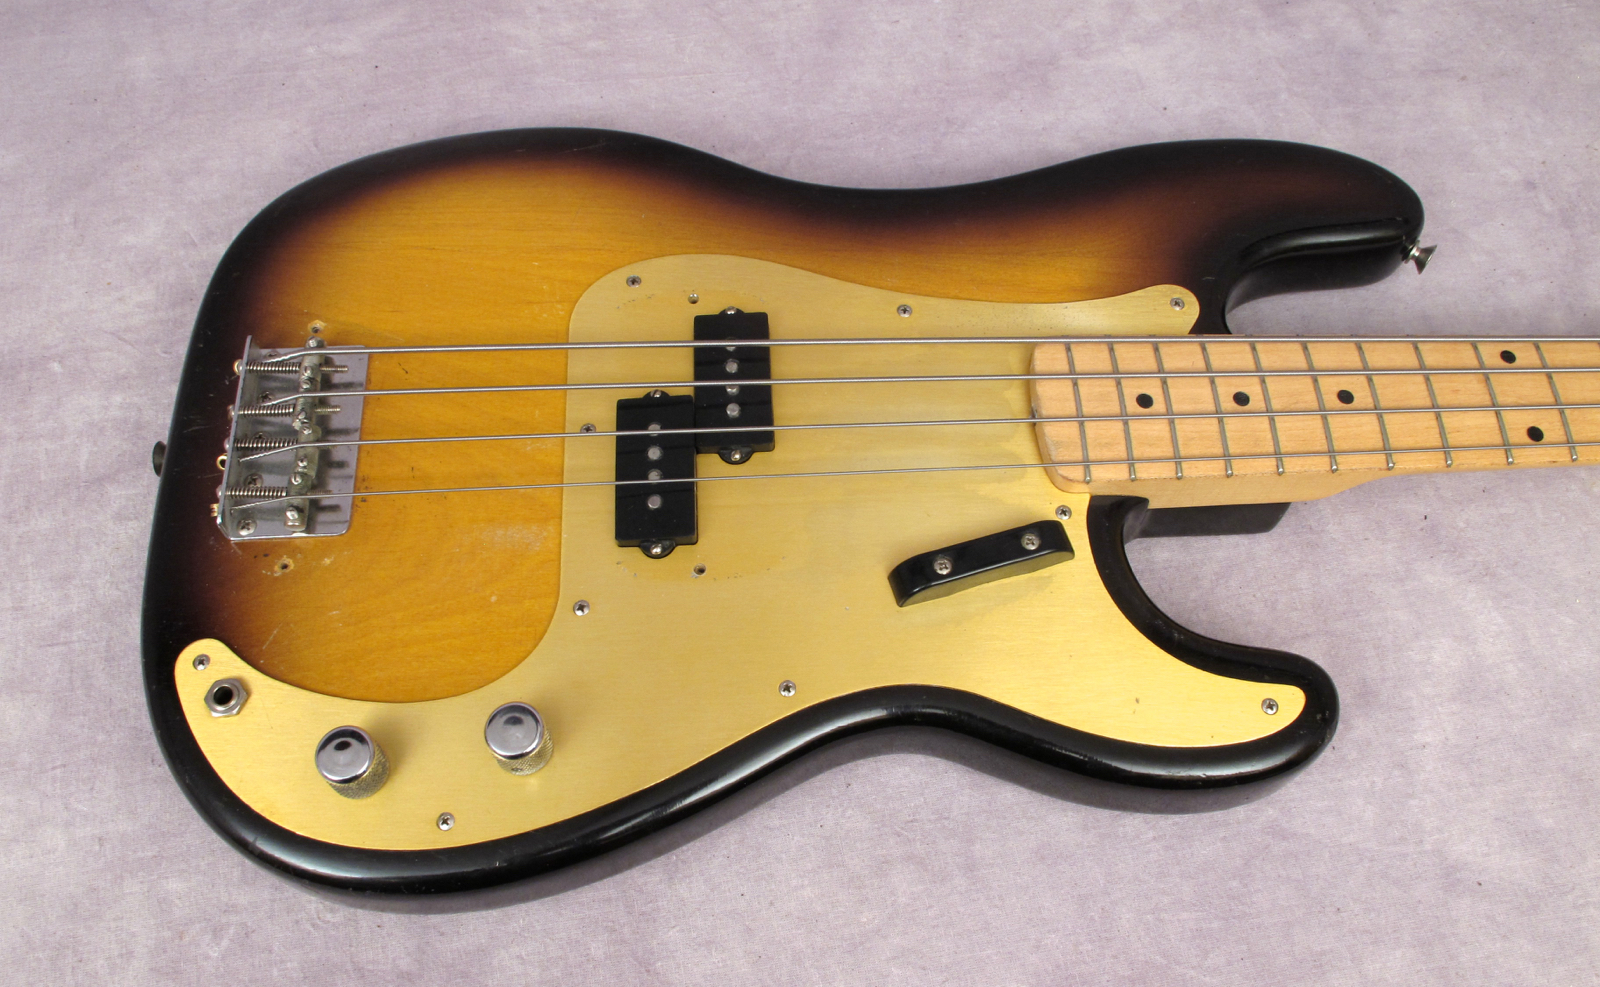 fender precision 1957 2 tone sunburst bass for sale andy baxter bass guitars ltd. Black Bedroom Furniture Sets. Home Design Ideas